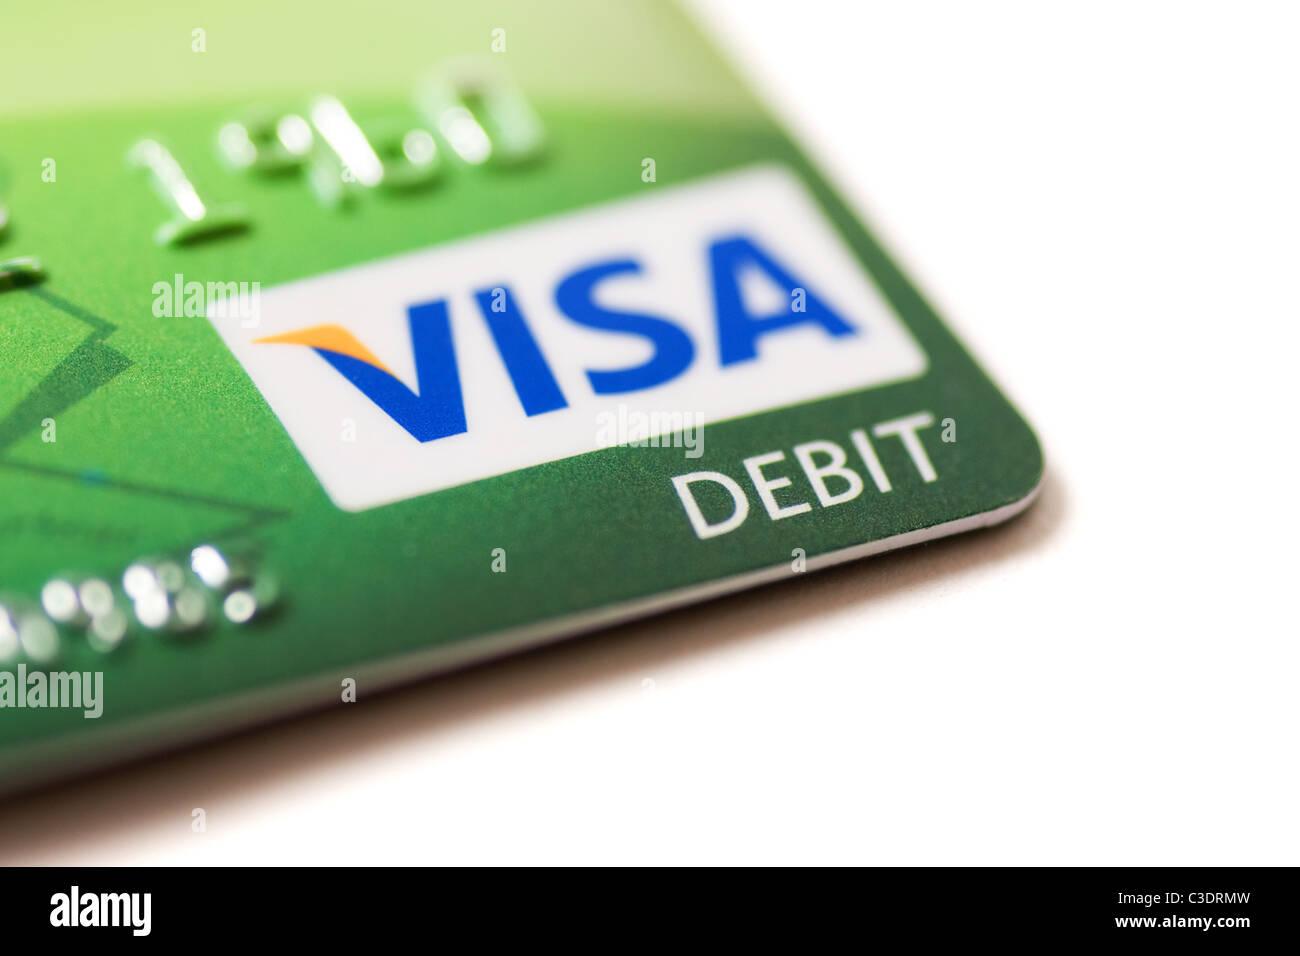 close up detail of a lloyds tsb visa debit card stock image - Visa Debit Card